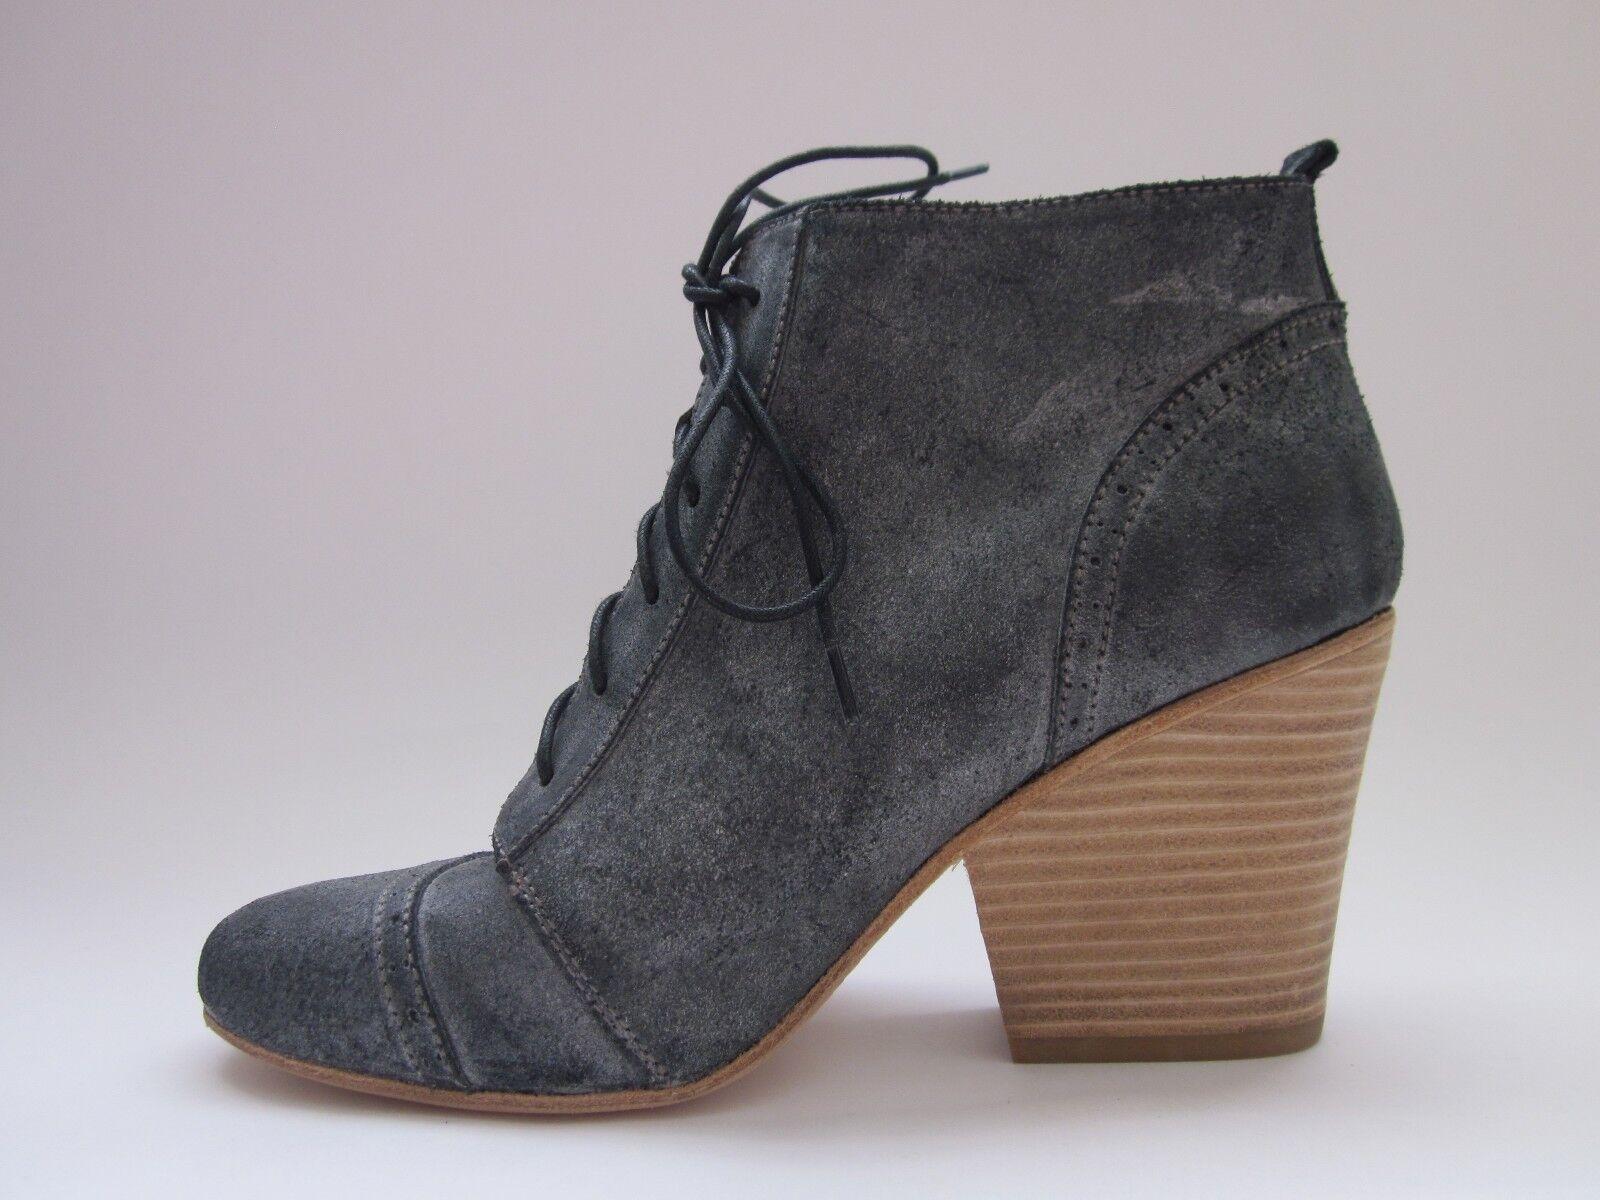 Fiel Fiel Fiel Thibault Fashion Ankle Boots Black Rubbed Women's 9.5 a9a6ab